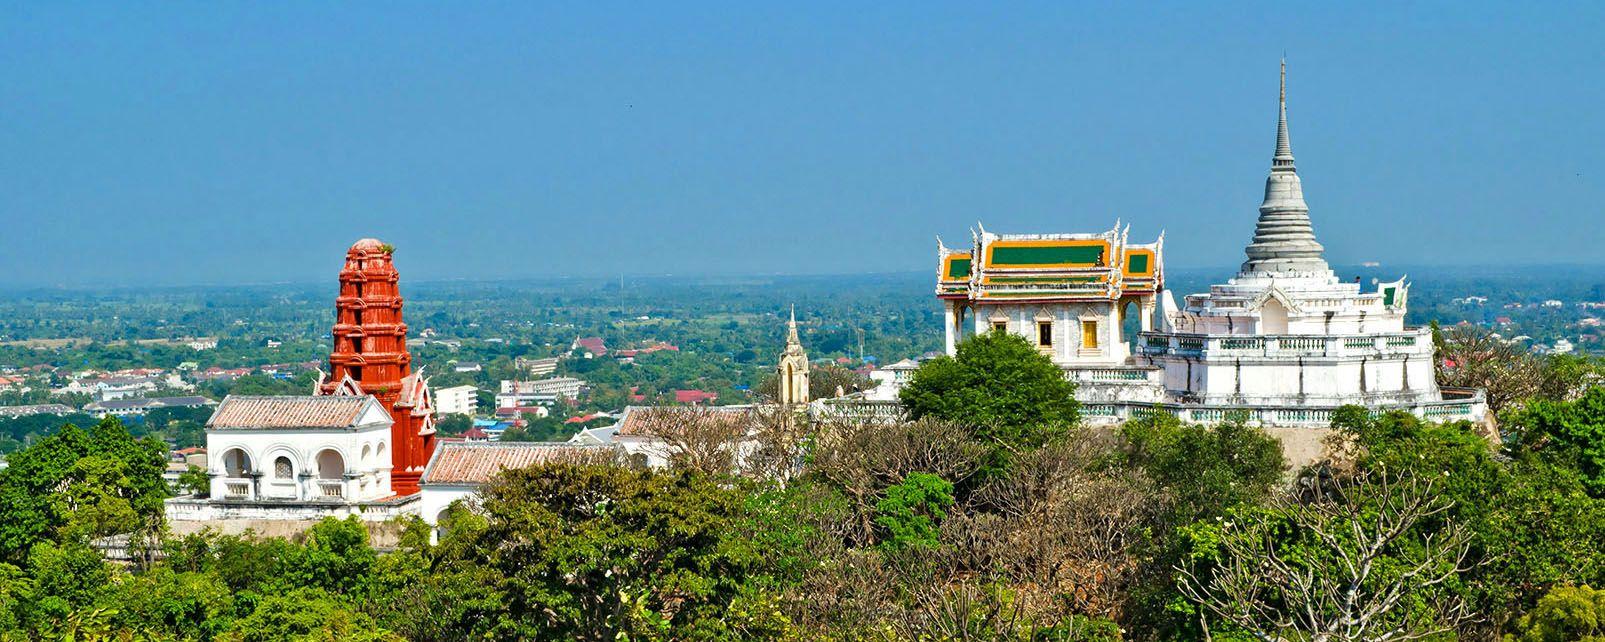 Phra Nakhon Khiri National Museum, Les monuments, Thaïlande